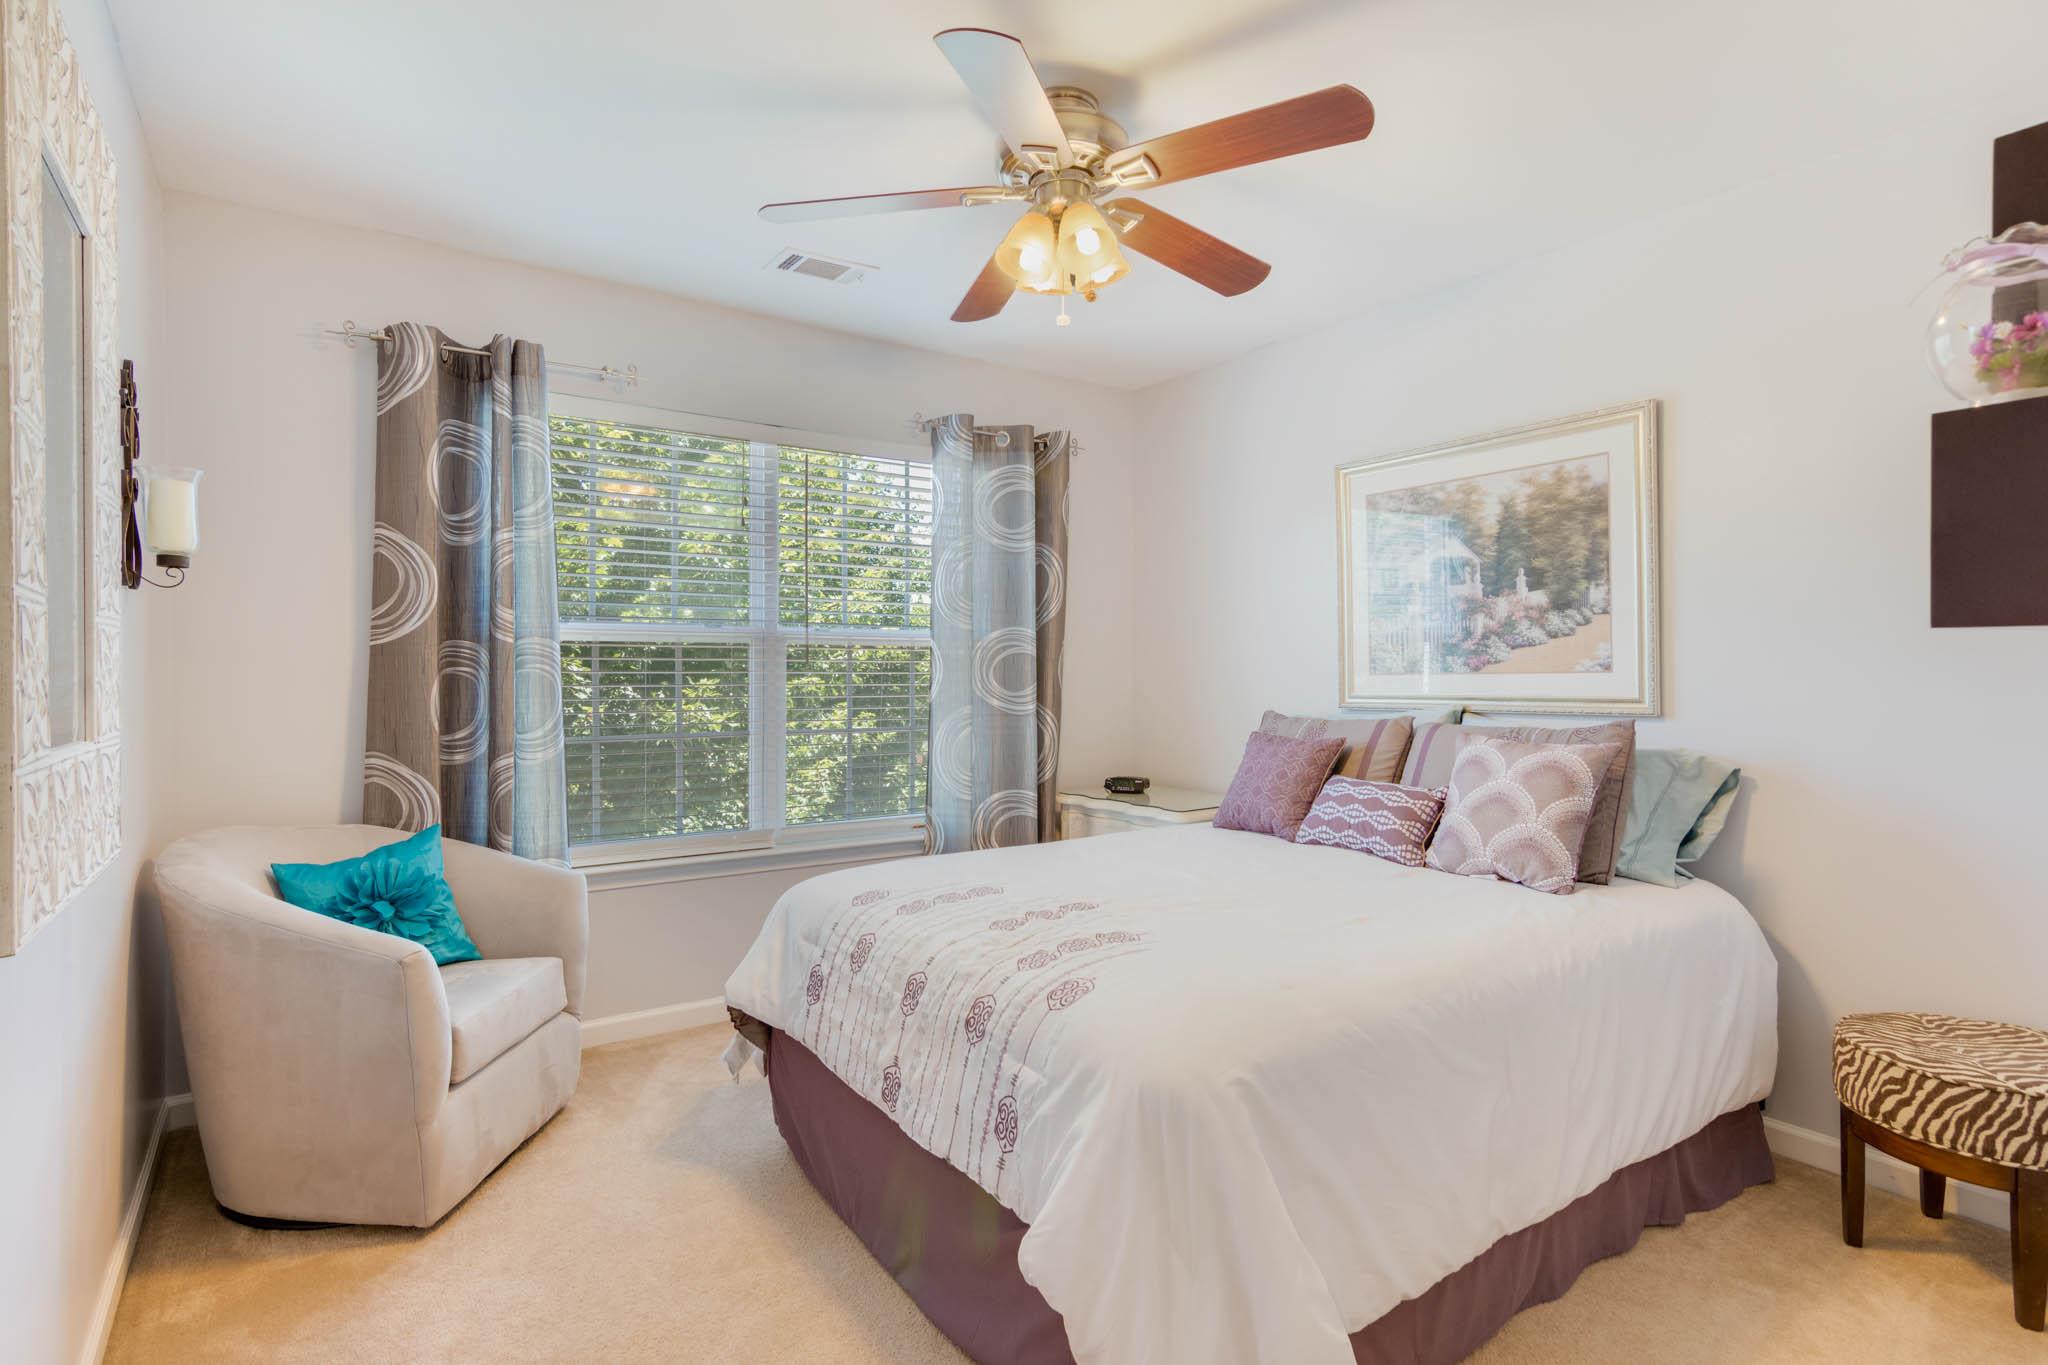 real_estate_photographer_bedroom_photography-9.jpg